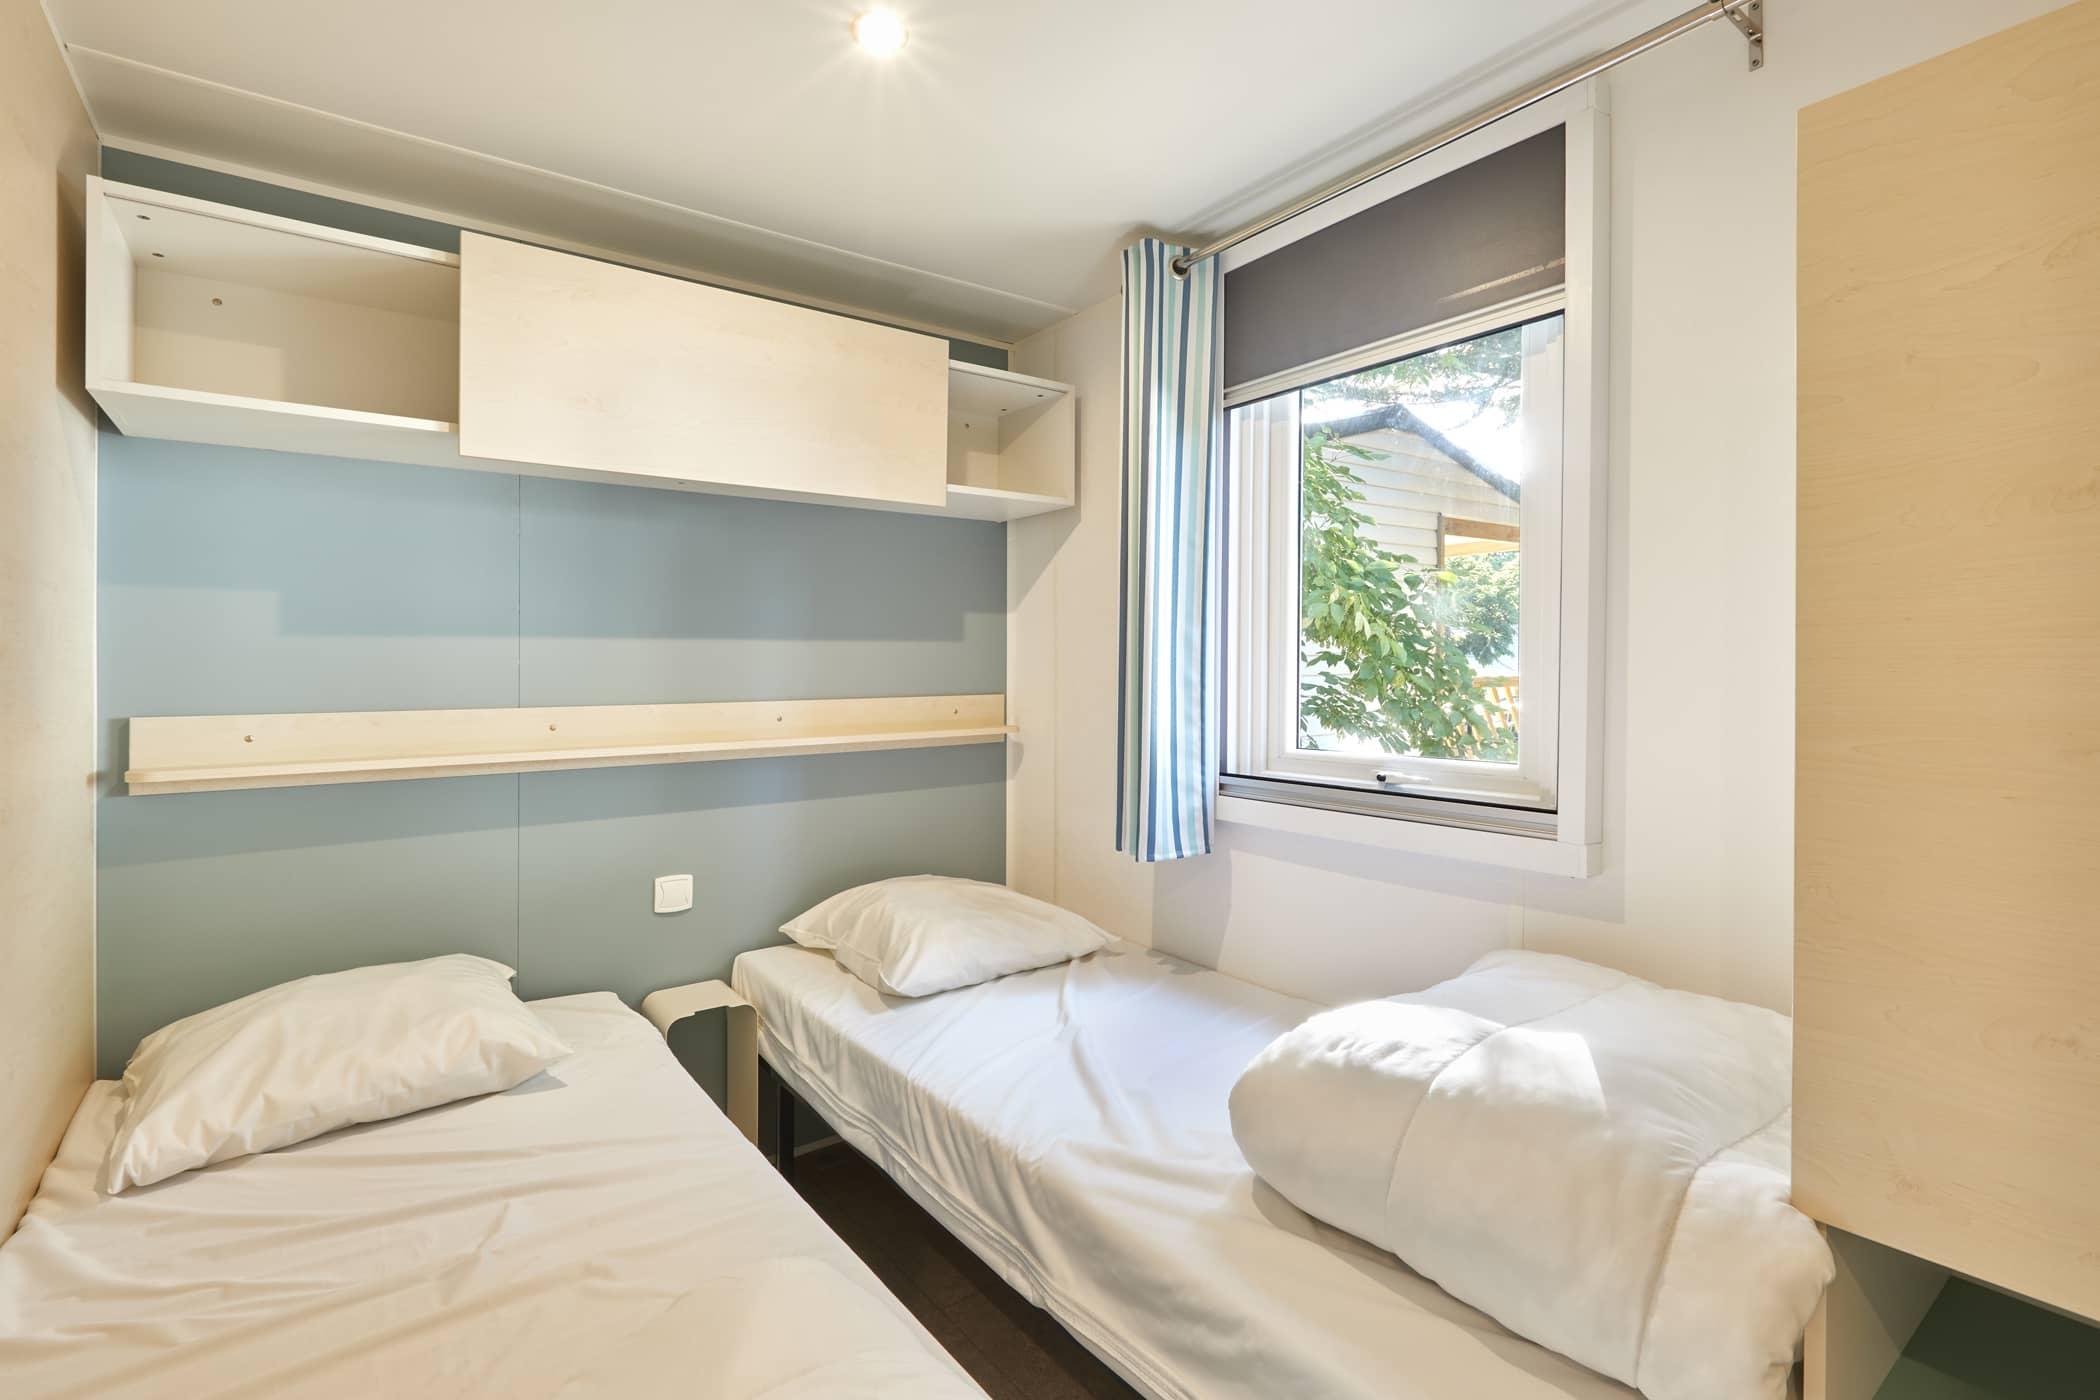 chambre lits jumeaux camping bord de mer